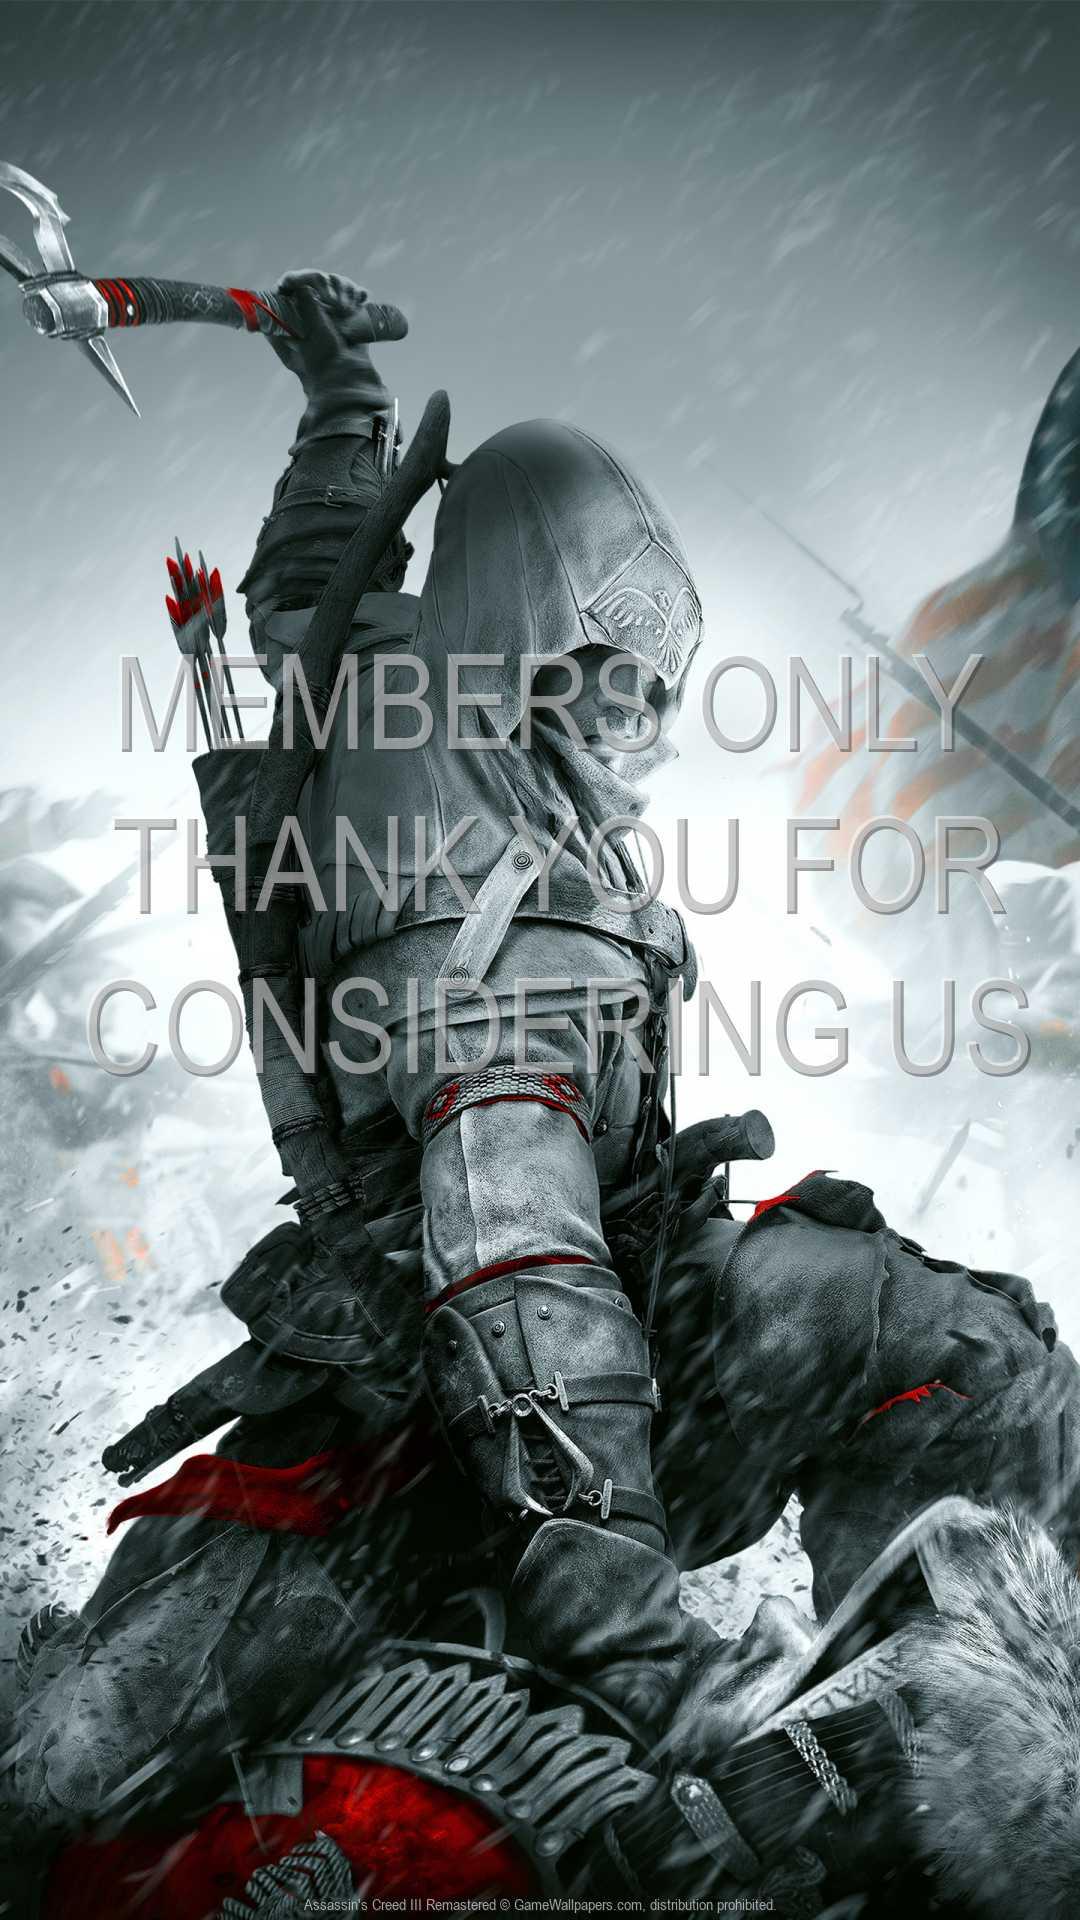 Assassin's Creed III: Remastered 1080p Vertical Handy Hintergrundbild 01